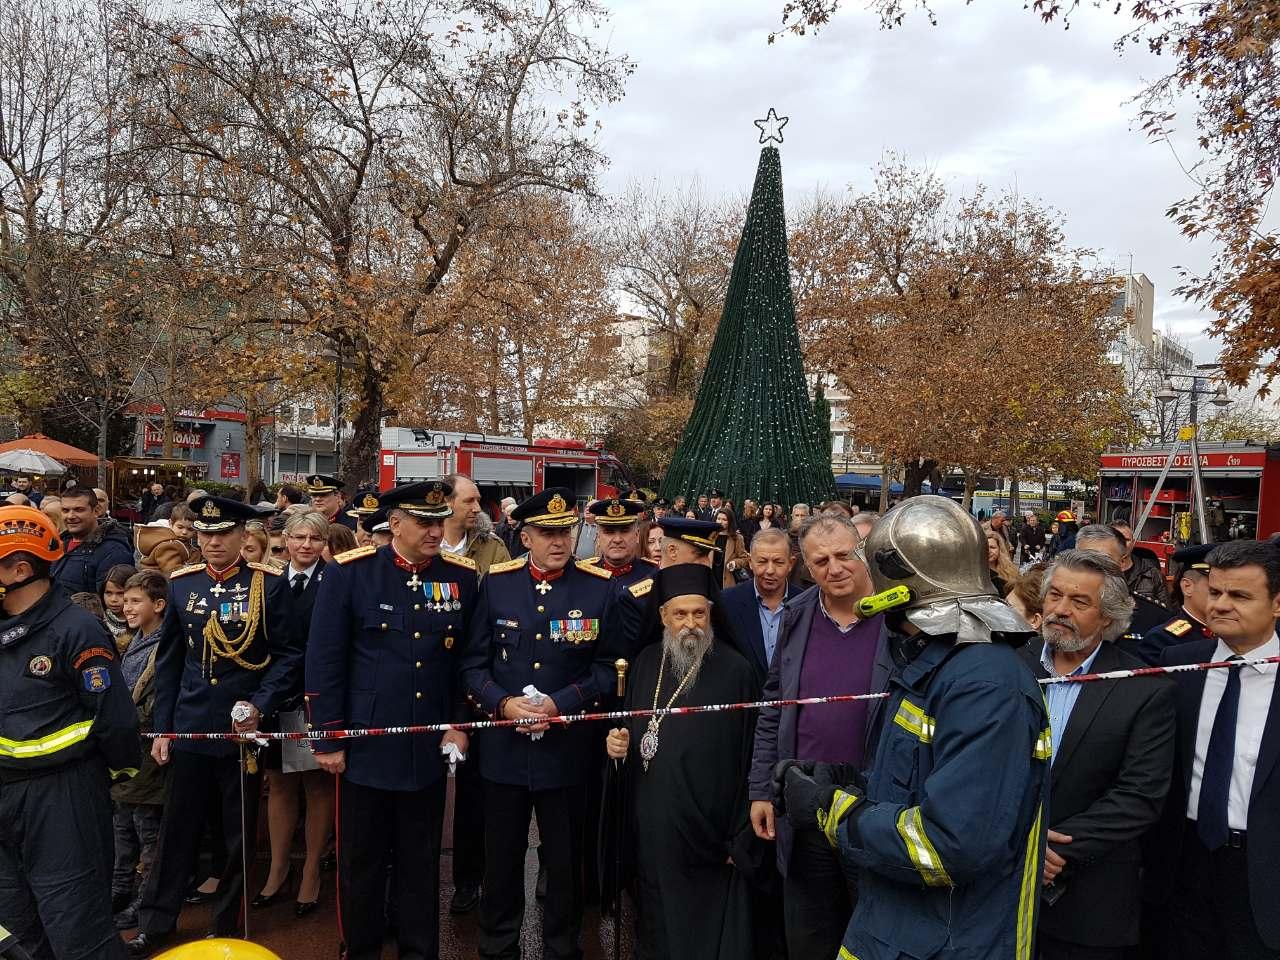 madenlidis pyrosvestikis 24 - O Σεβασμιώτατος ευλόγησε την εντυπωσιακή επίδειξη από την Πυροσβεστικής Υπηρεσίας Λάρισας